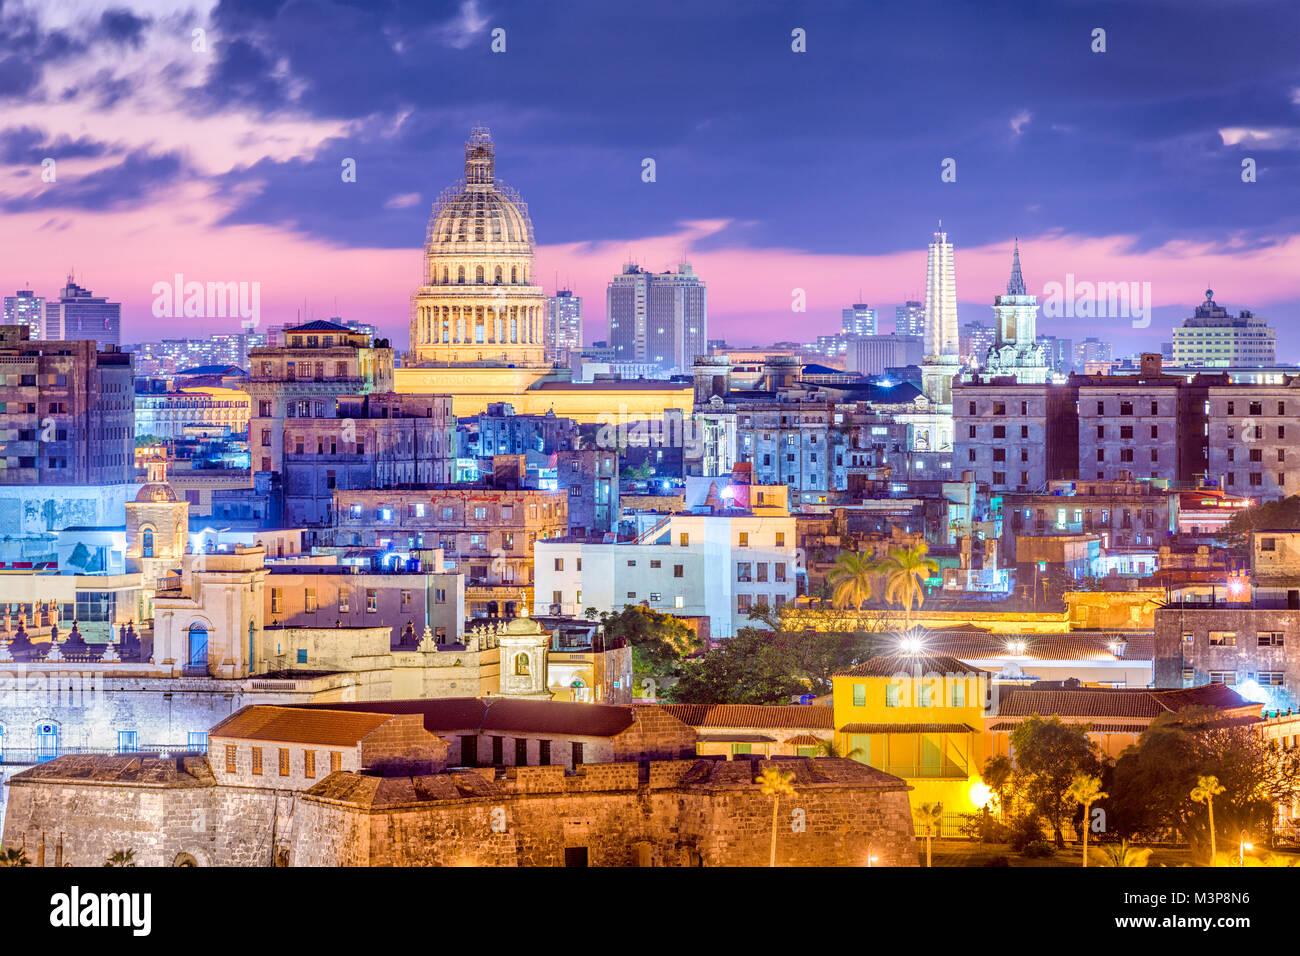 Havanna, Kuba Downtown Skyline. Stockbild